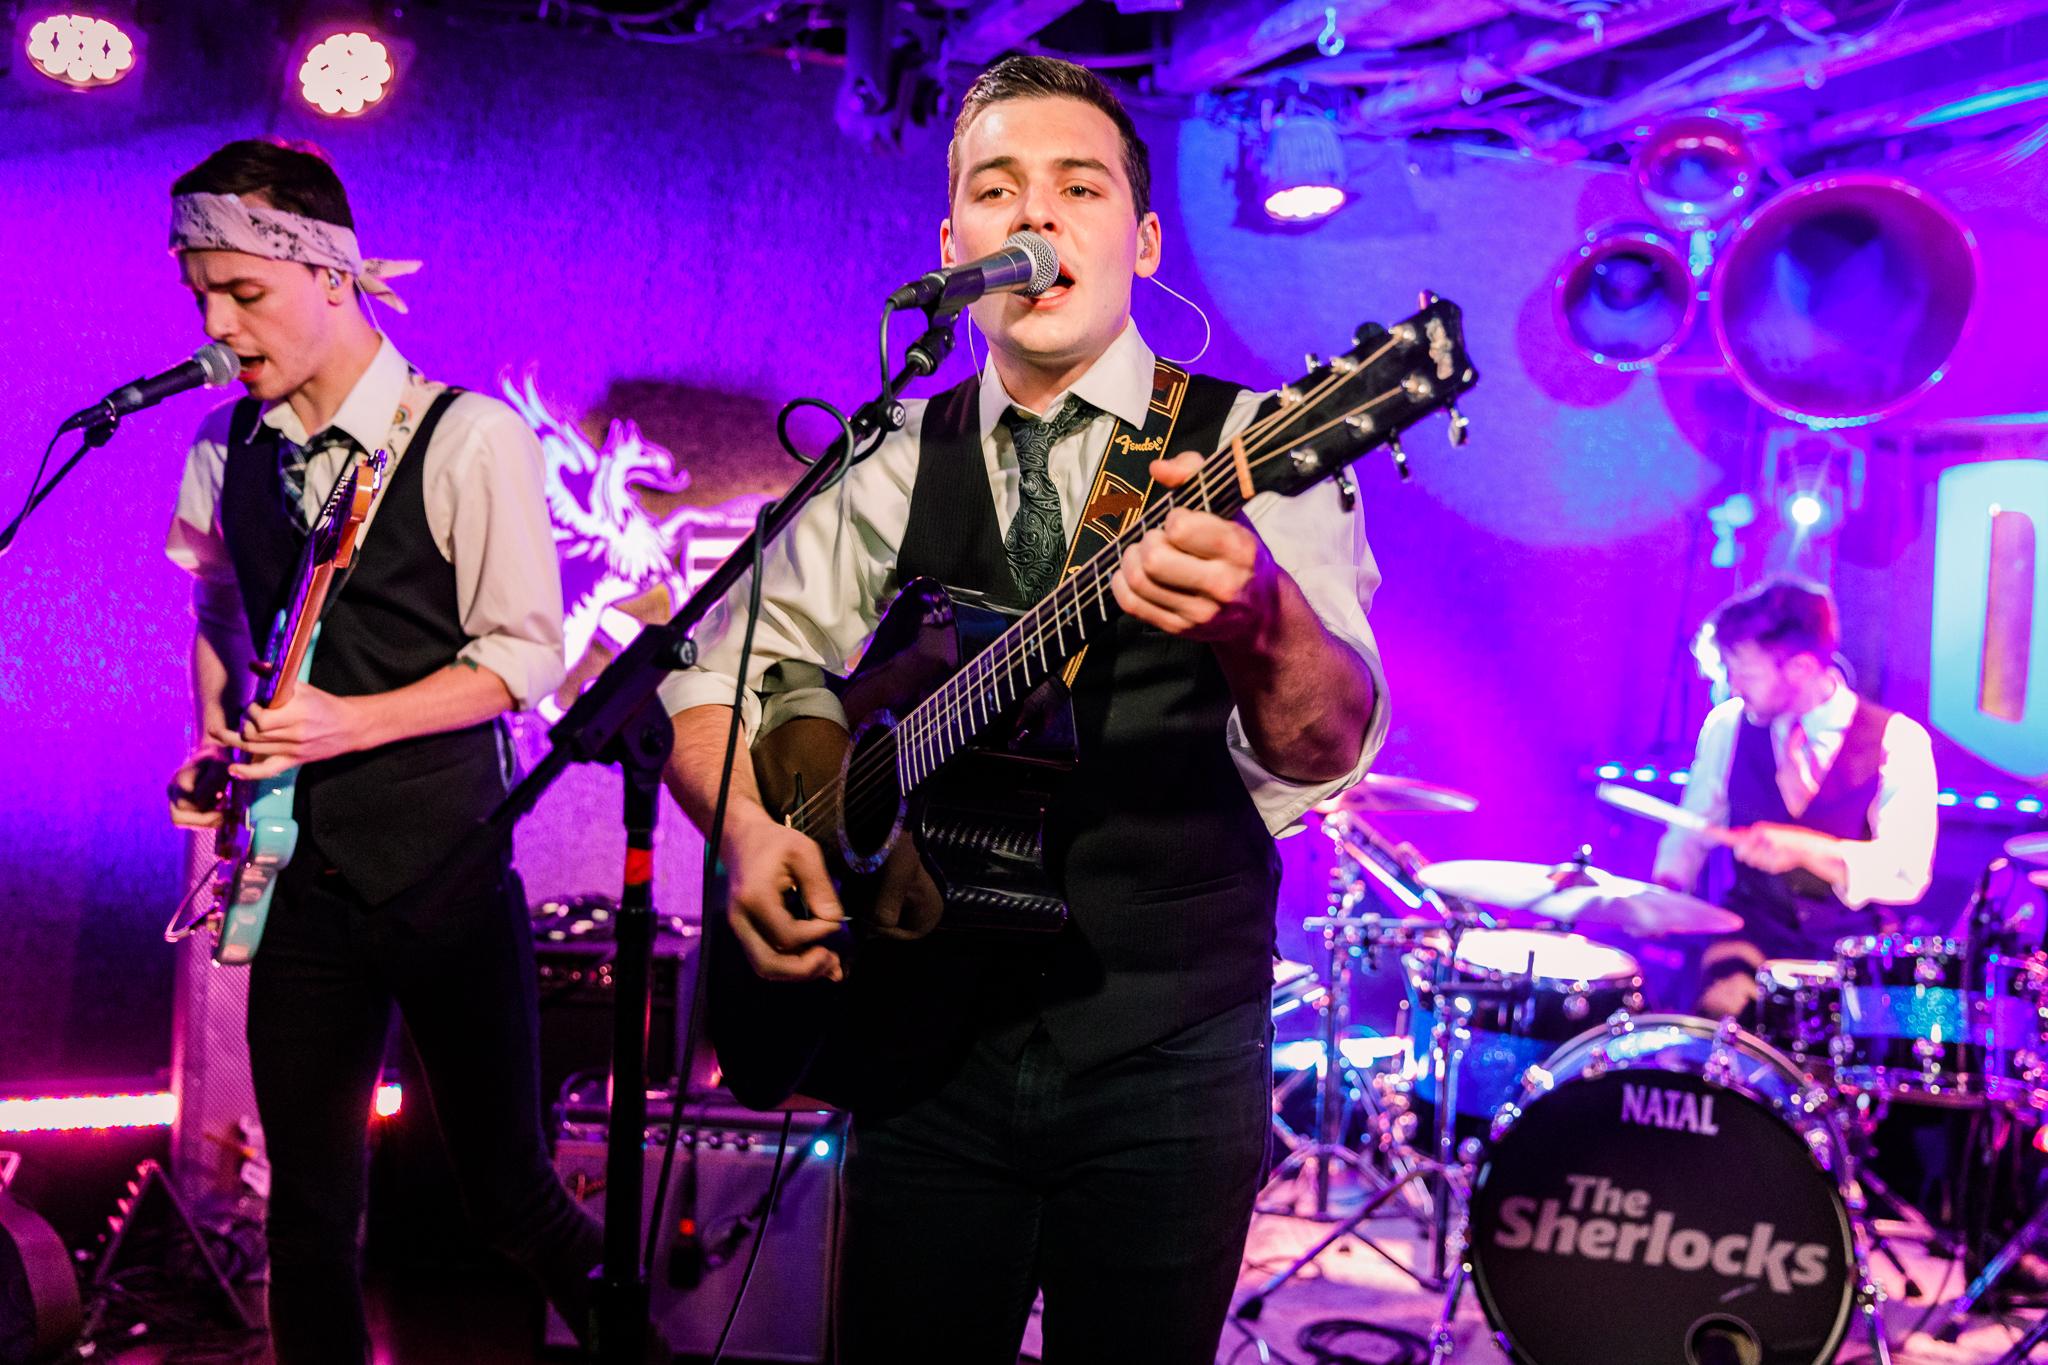 Broke Royals performing at DC9 in Washington, DC - 5/7/2018 (photo by Matt Condon / @arcane93)